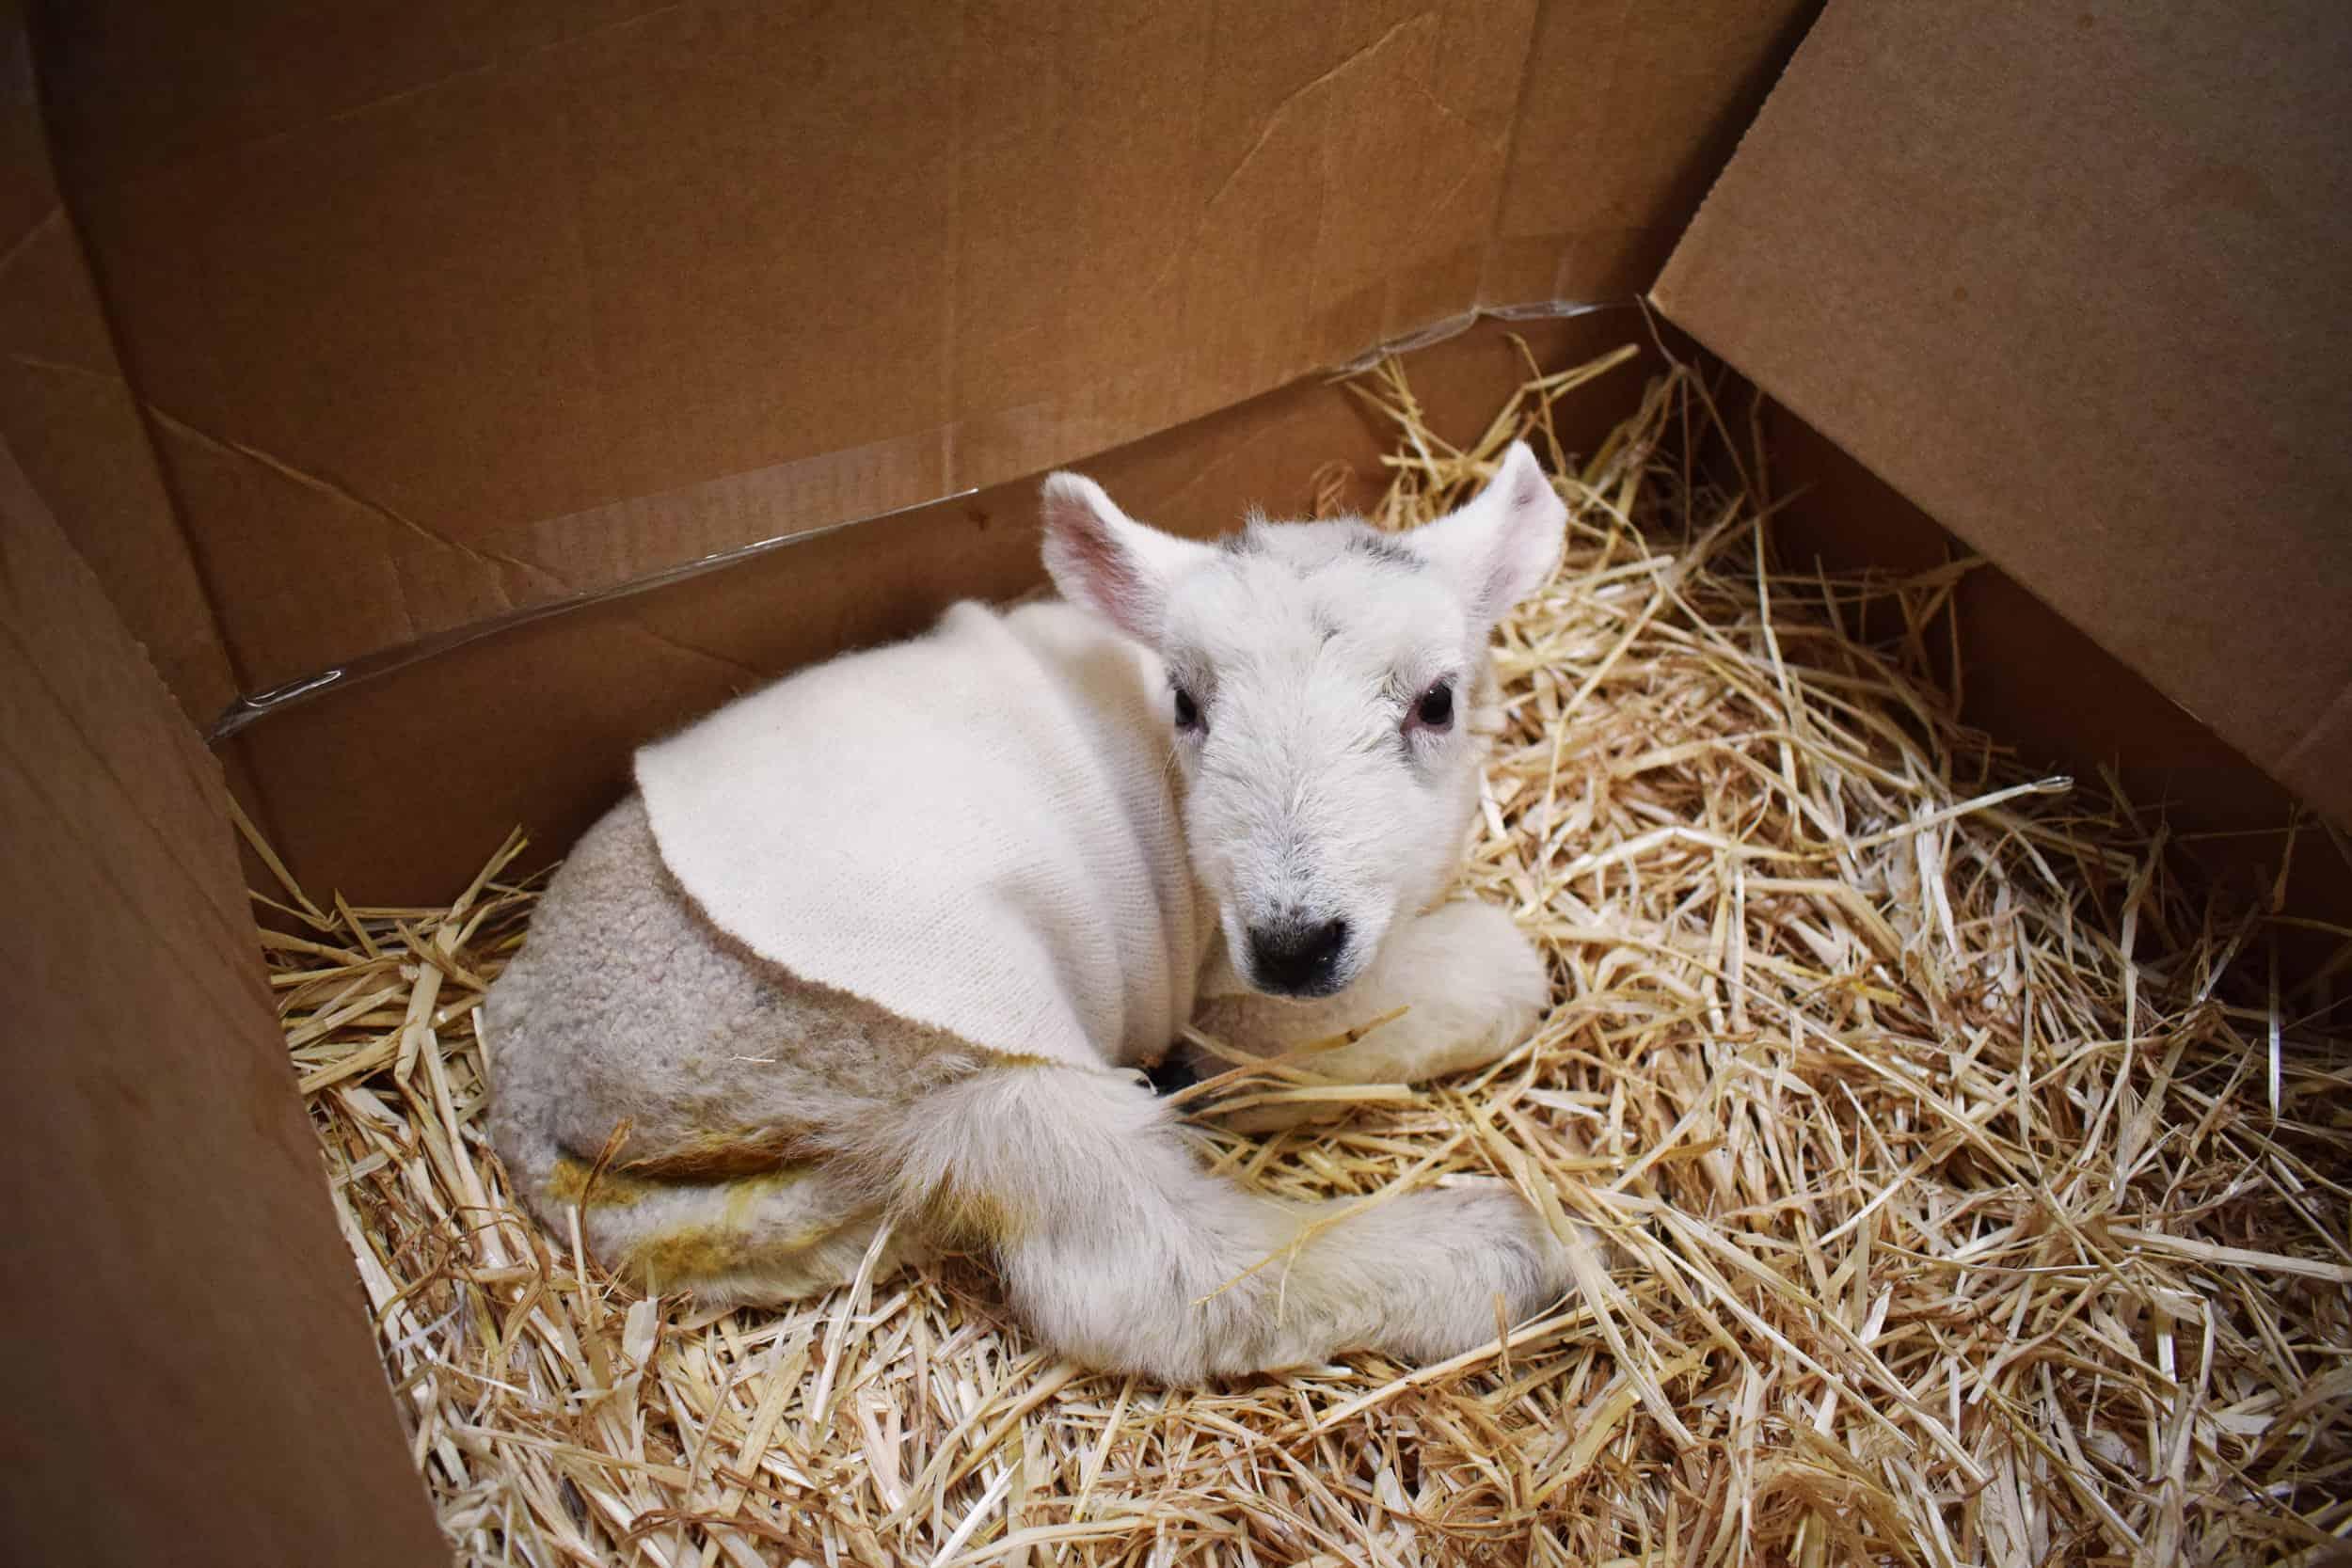 Lily box bfl blueface leicester sheep ewe lamb pet bottle baby lamb